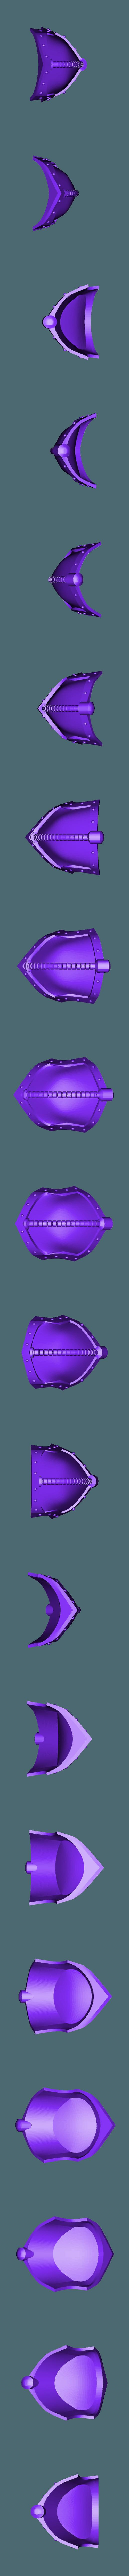 Pauldron_1.stl Download free STL file Cronusine Pattern Terminator Builder • 3D printing template, HappyDuck3D